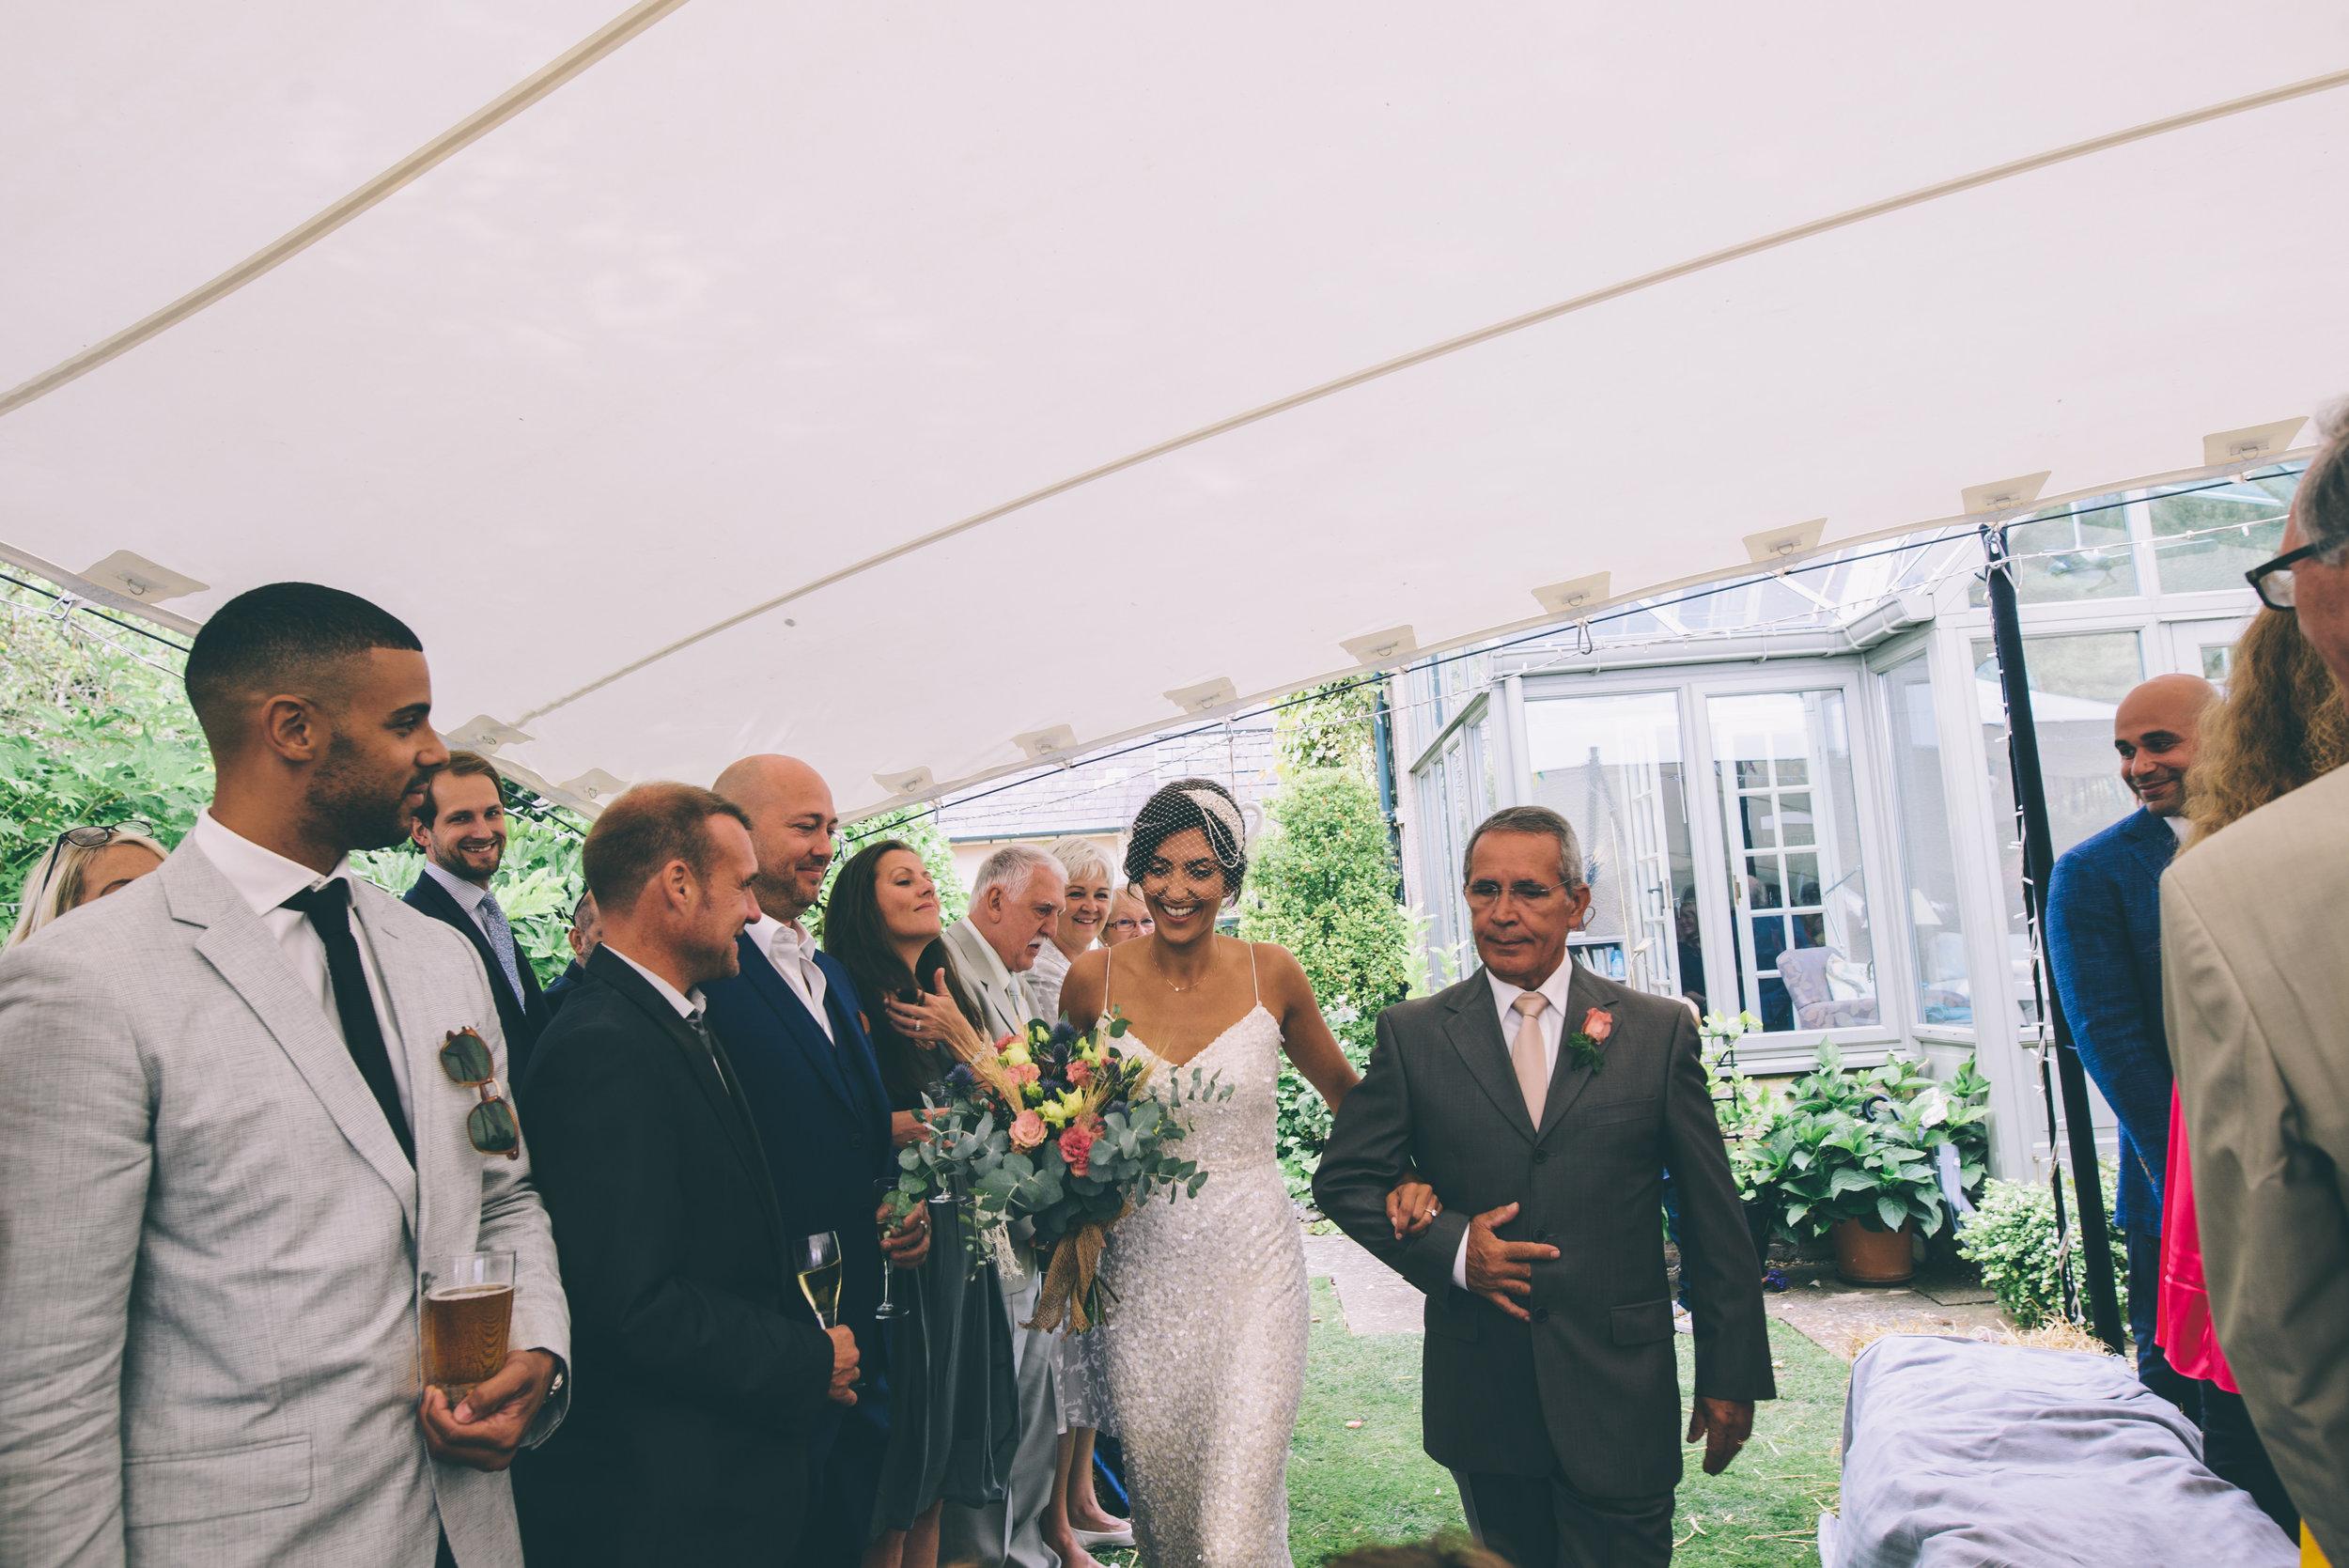 Garden Wedding photography Barley Herefordshire - Tracy + Matt -143.jpg